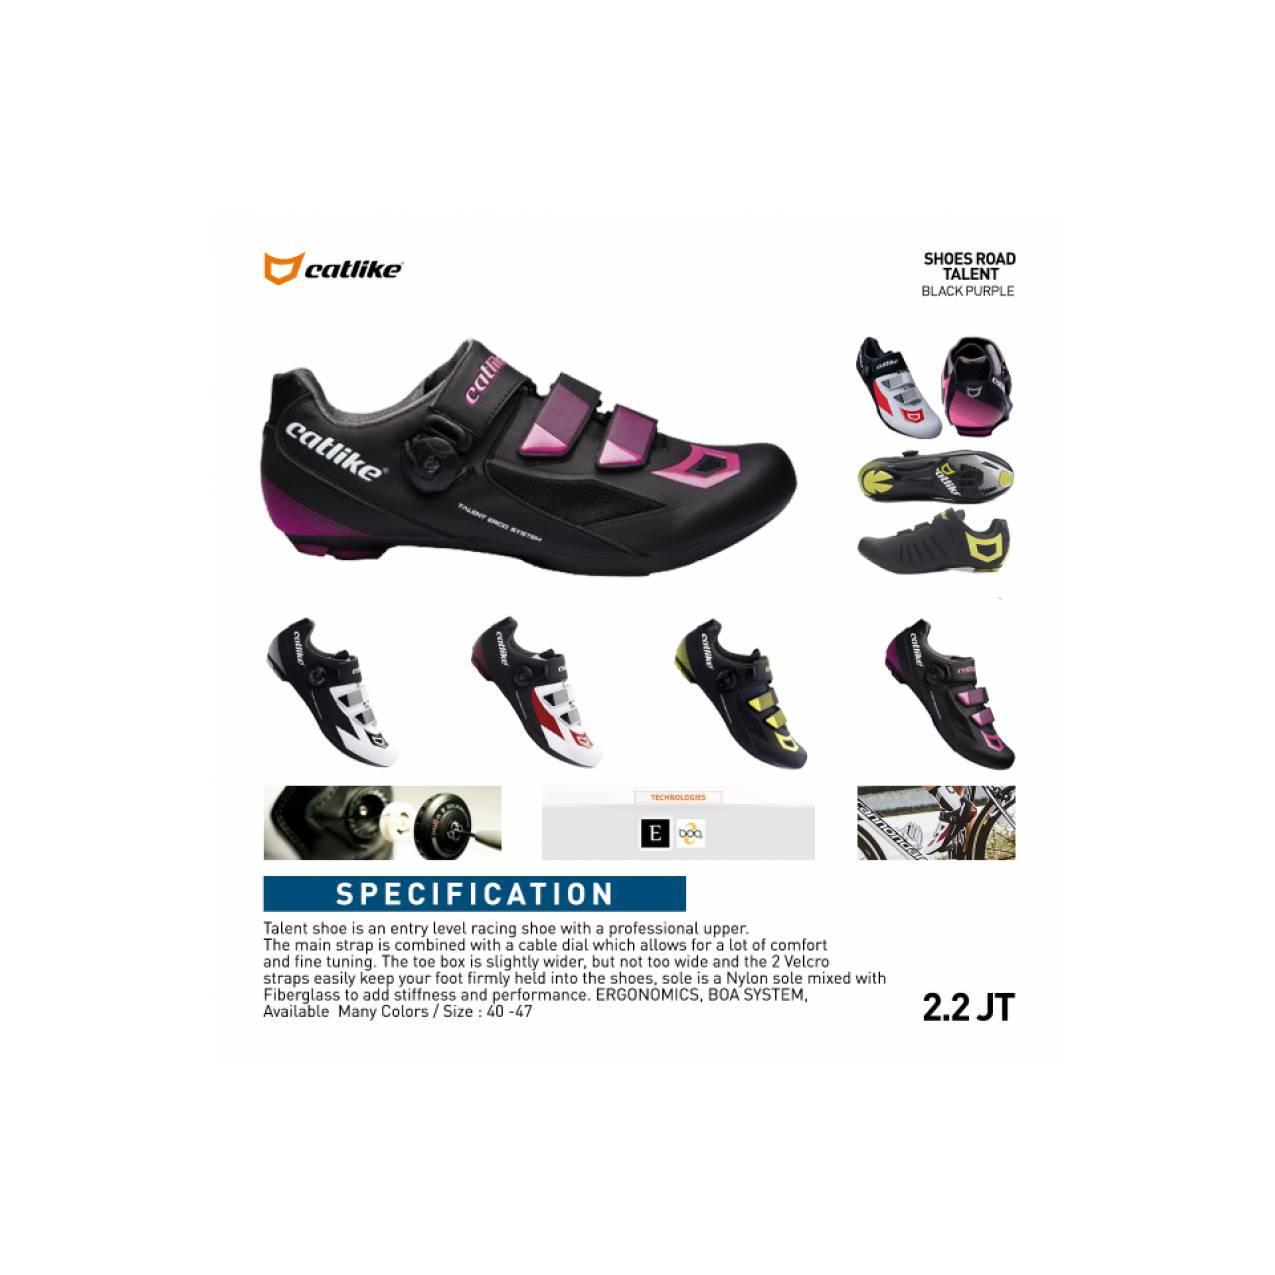 Shoes Catlike Talent Multi-Cleat Road & Mtb BLACK PURPLE Sepatu cleat